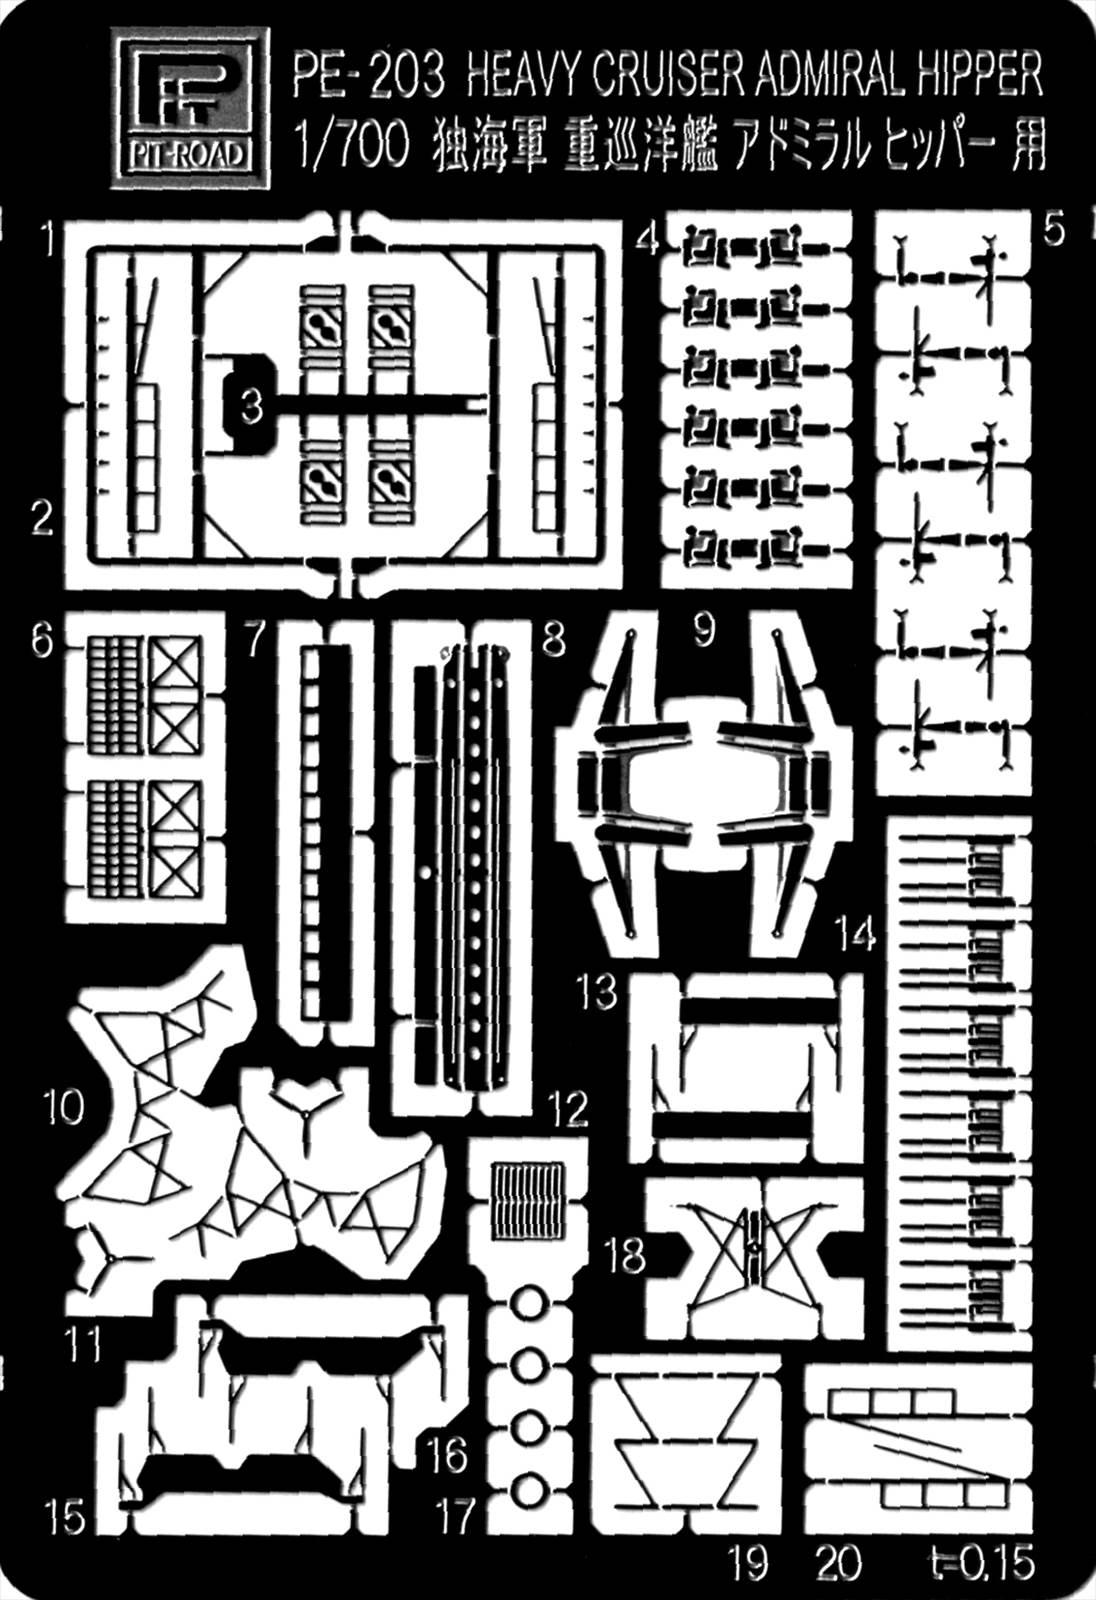 PE203 1/700 WWII ドイツ海軍 重巡洋艦 アドミラル・ヒッパー用 エッチングパーツ